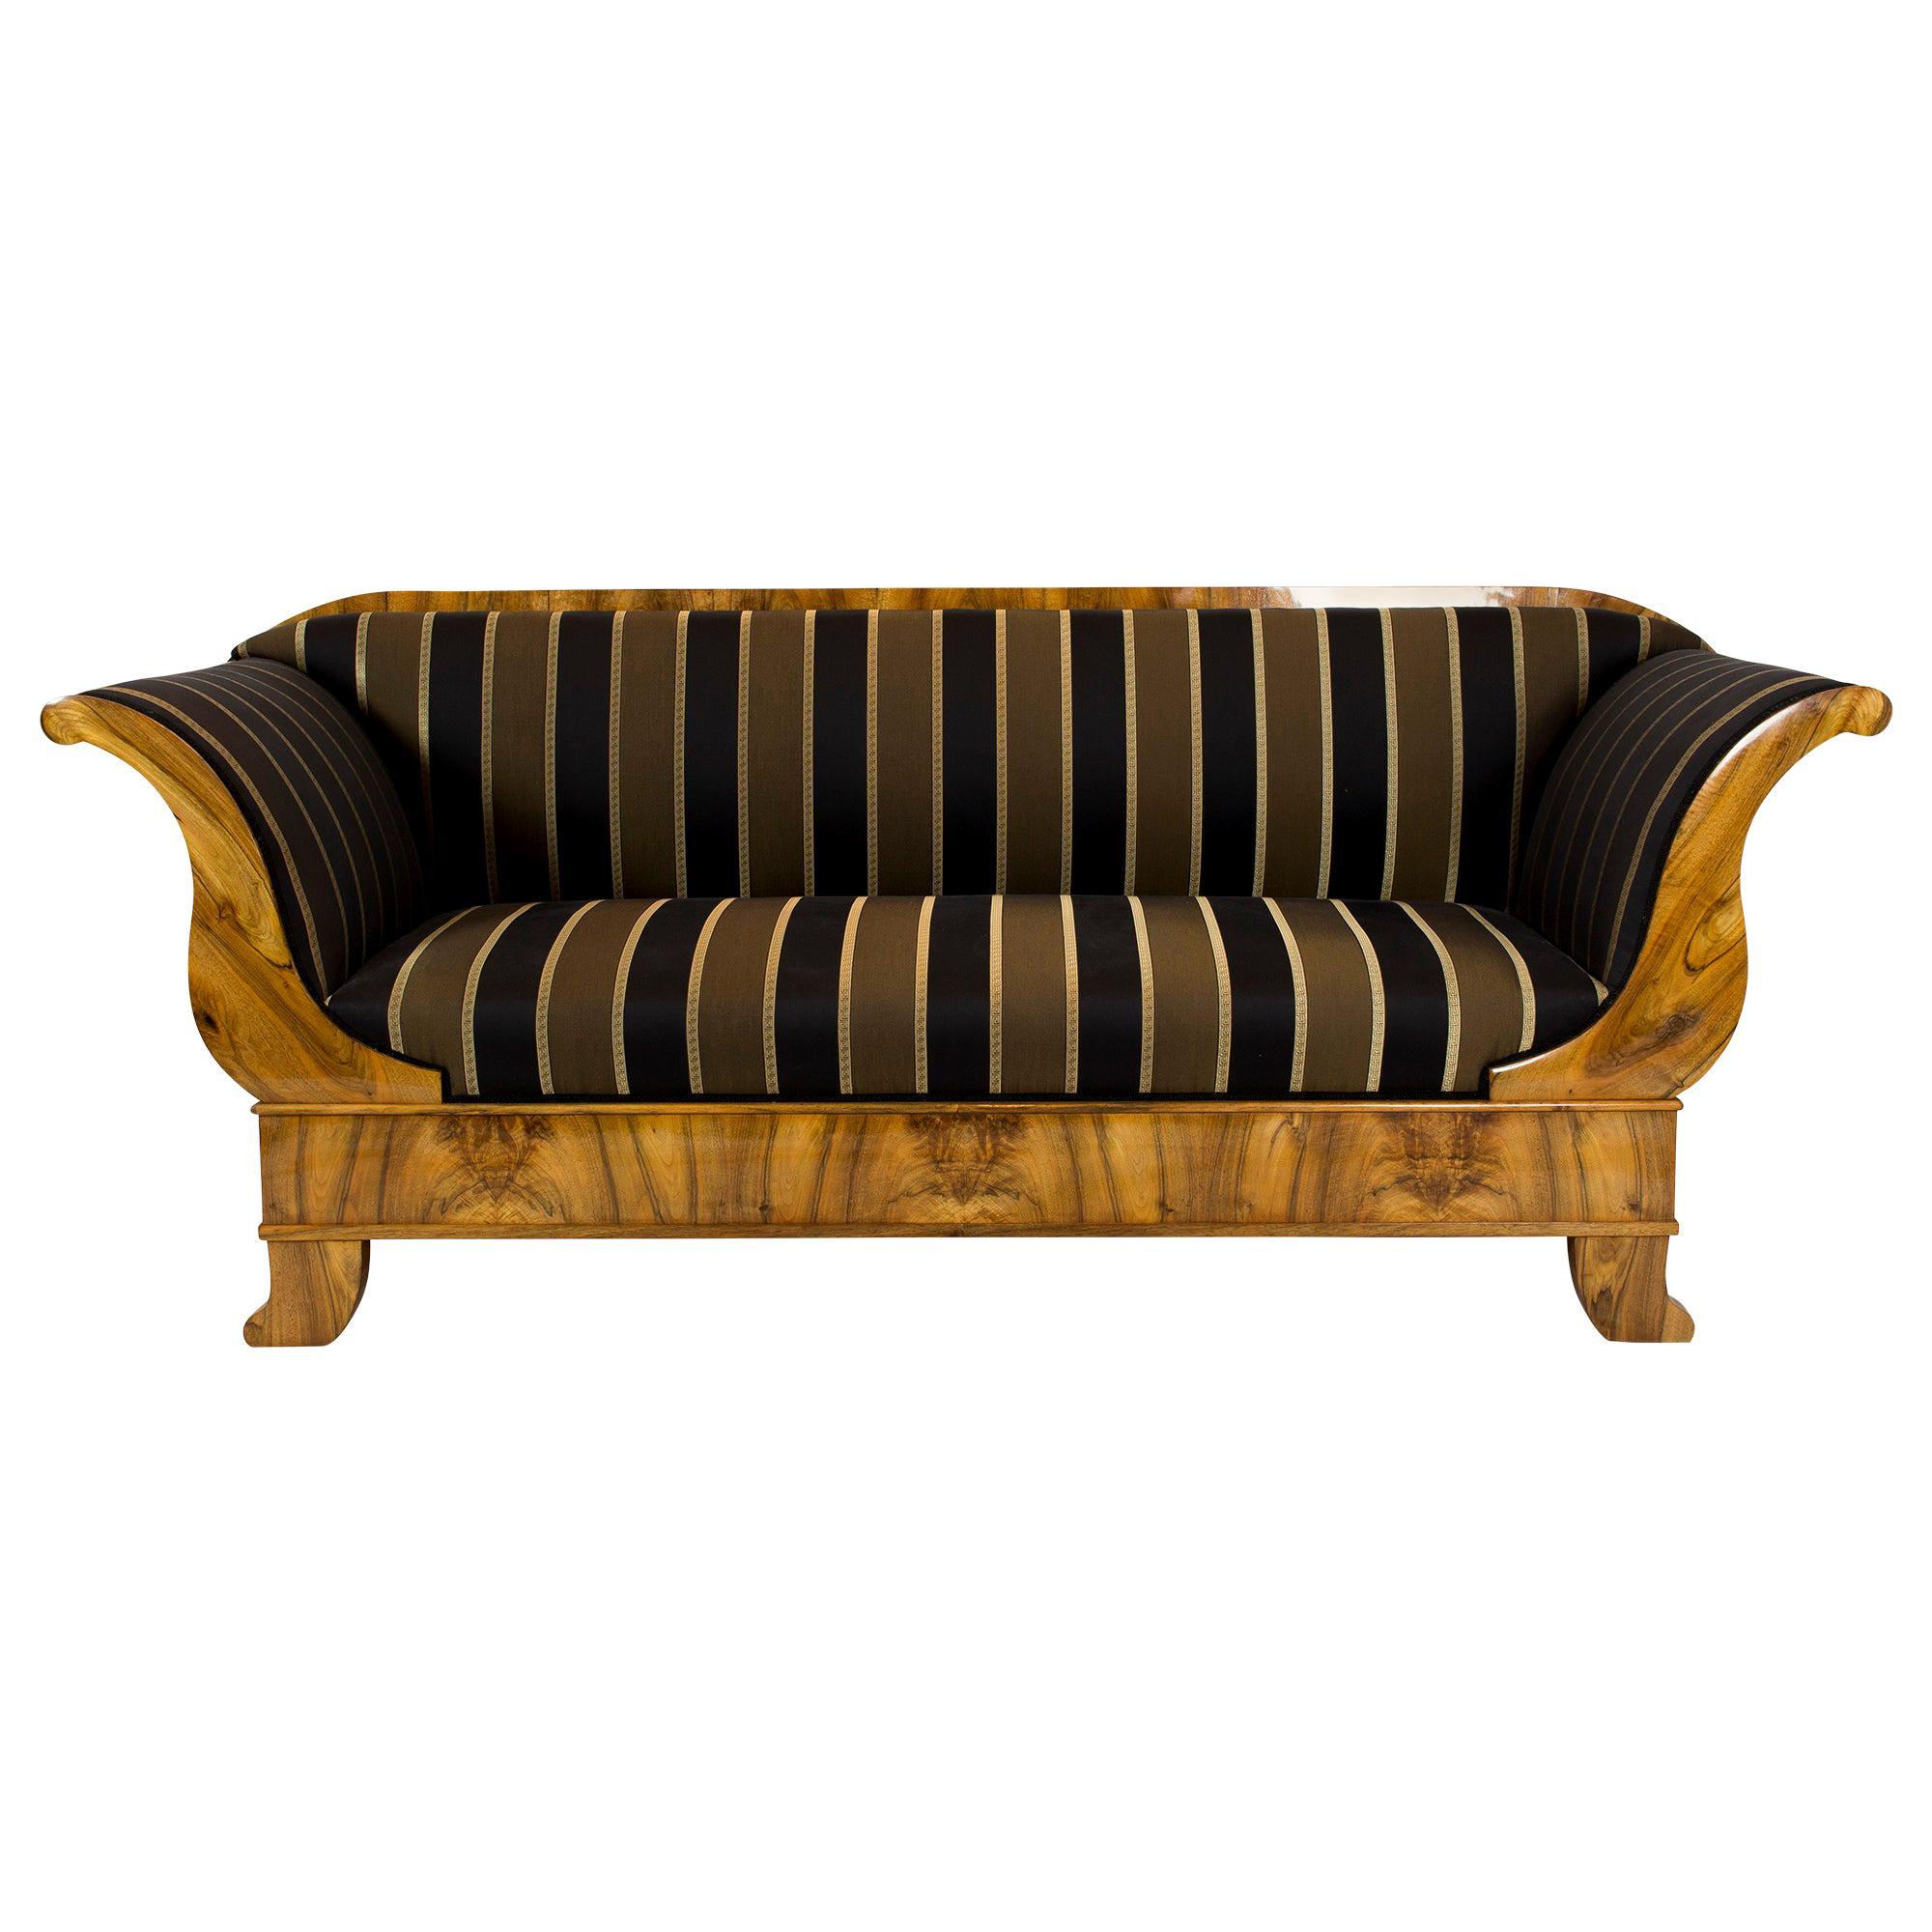 Early 19th Century Biedermeier Walnut Sofa from Germany